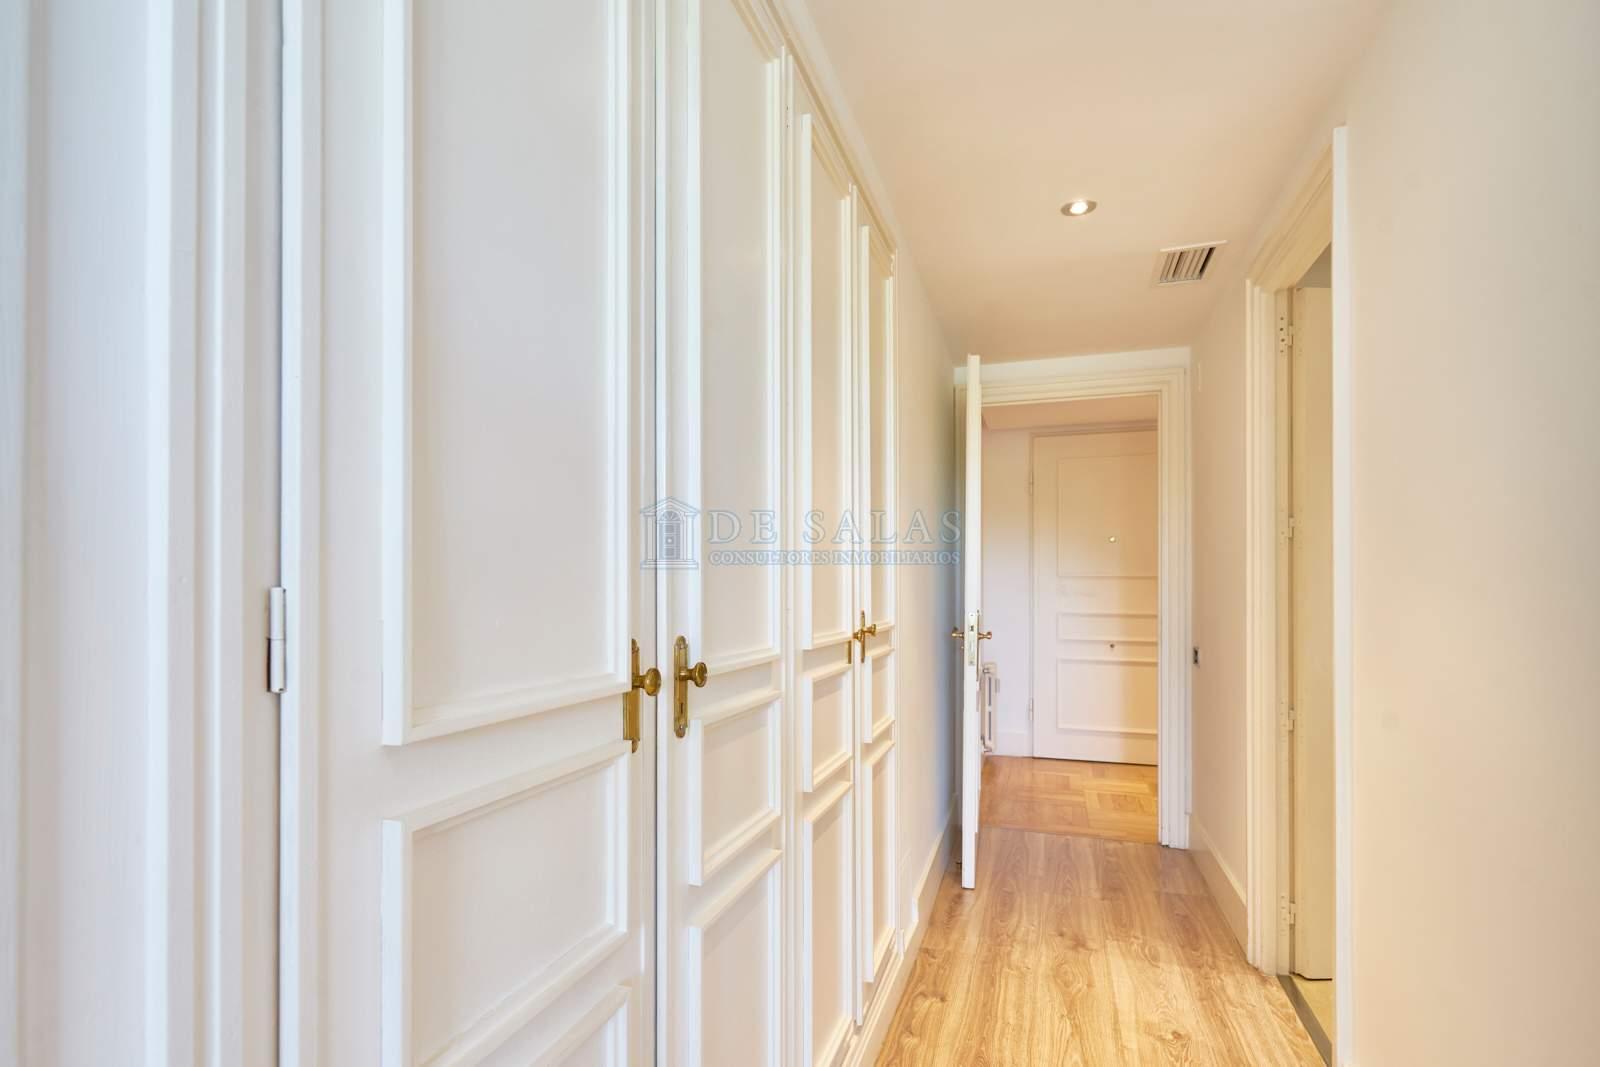 Dormitorio-0023